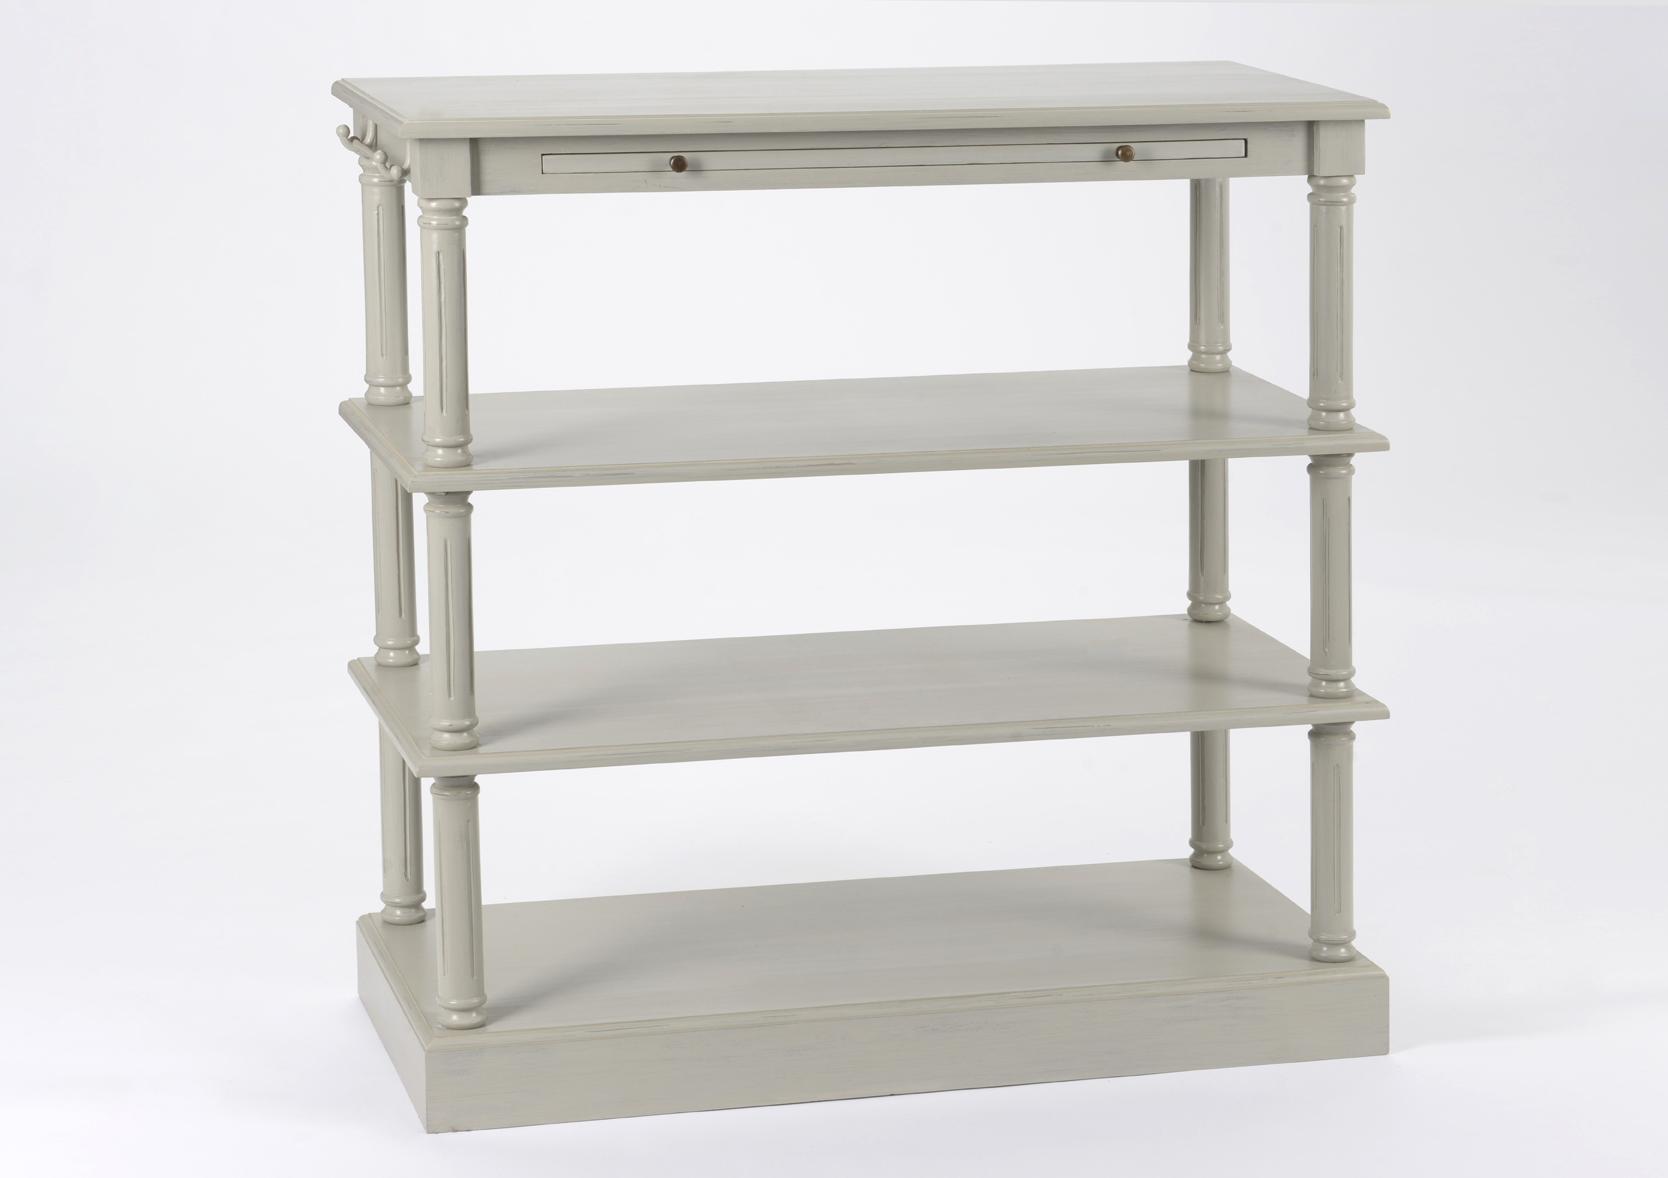 console drapier tablettes edouard amadeus 122142 o magasin de meubles deco orl ans. Black Bedroom Furniture Sets. Home Design Ideas